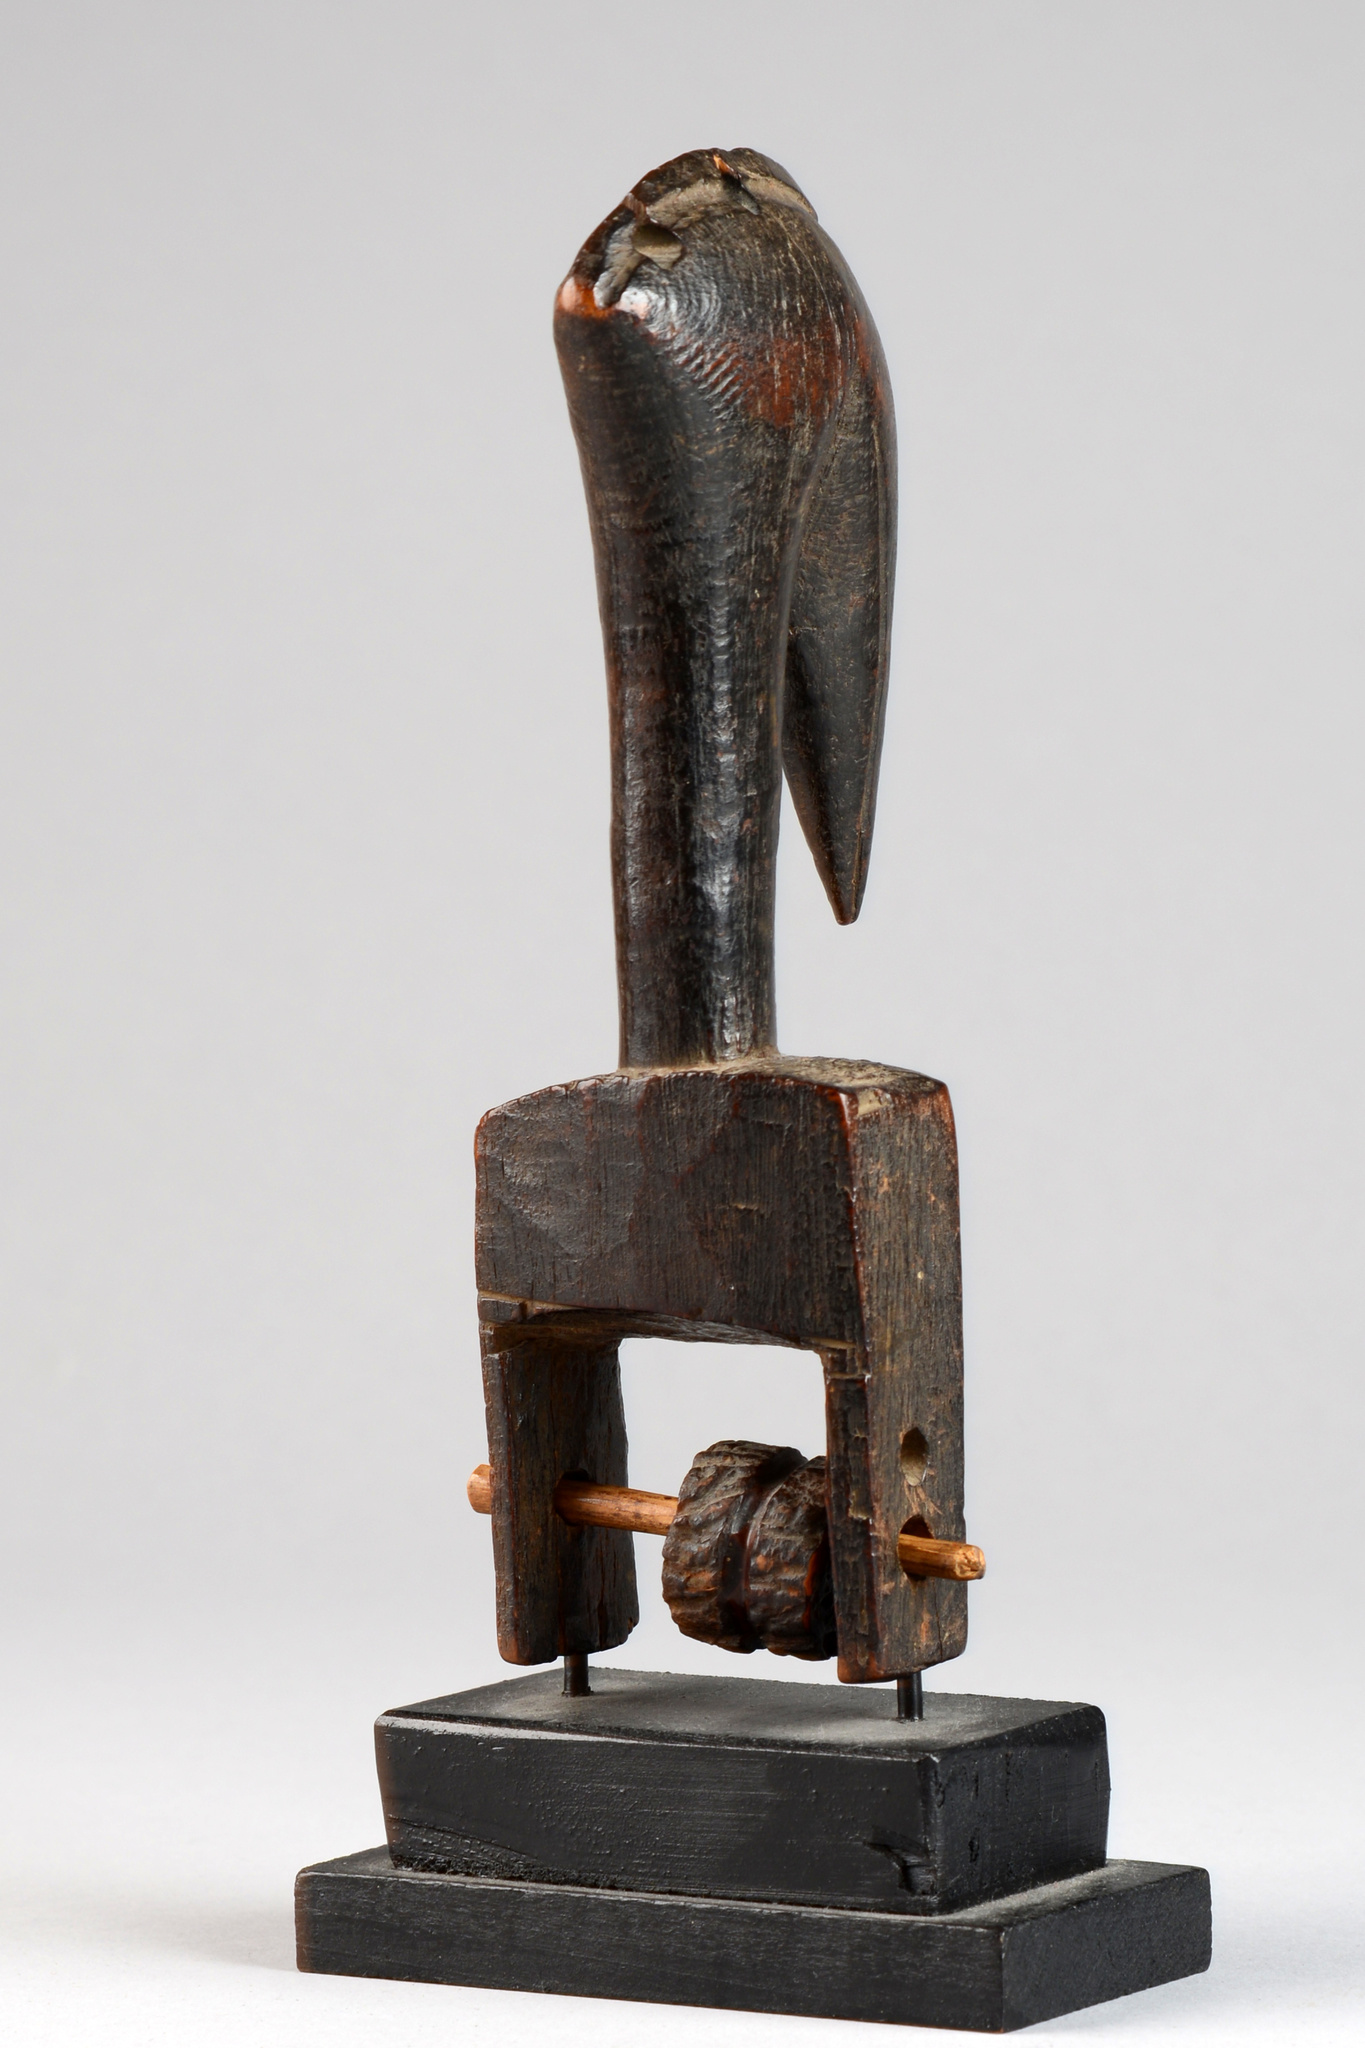 Webrollenhalter mit Nashornvogelkopf